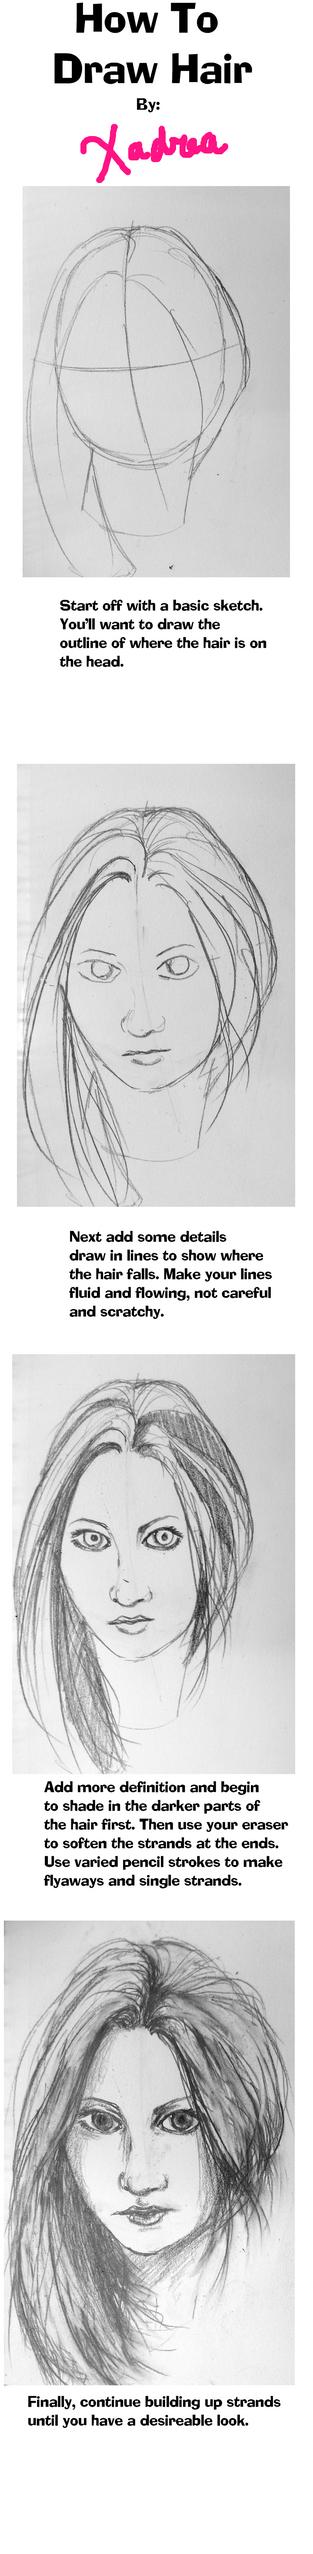 Hair Tutorial by Xadrea